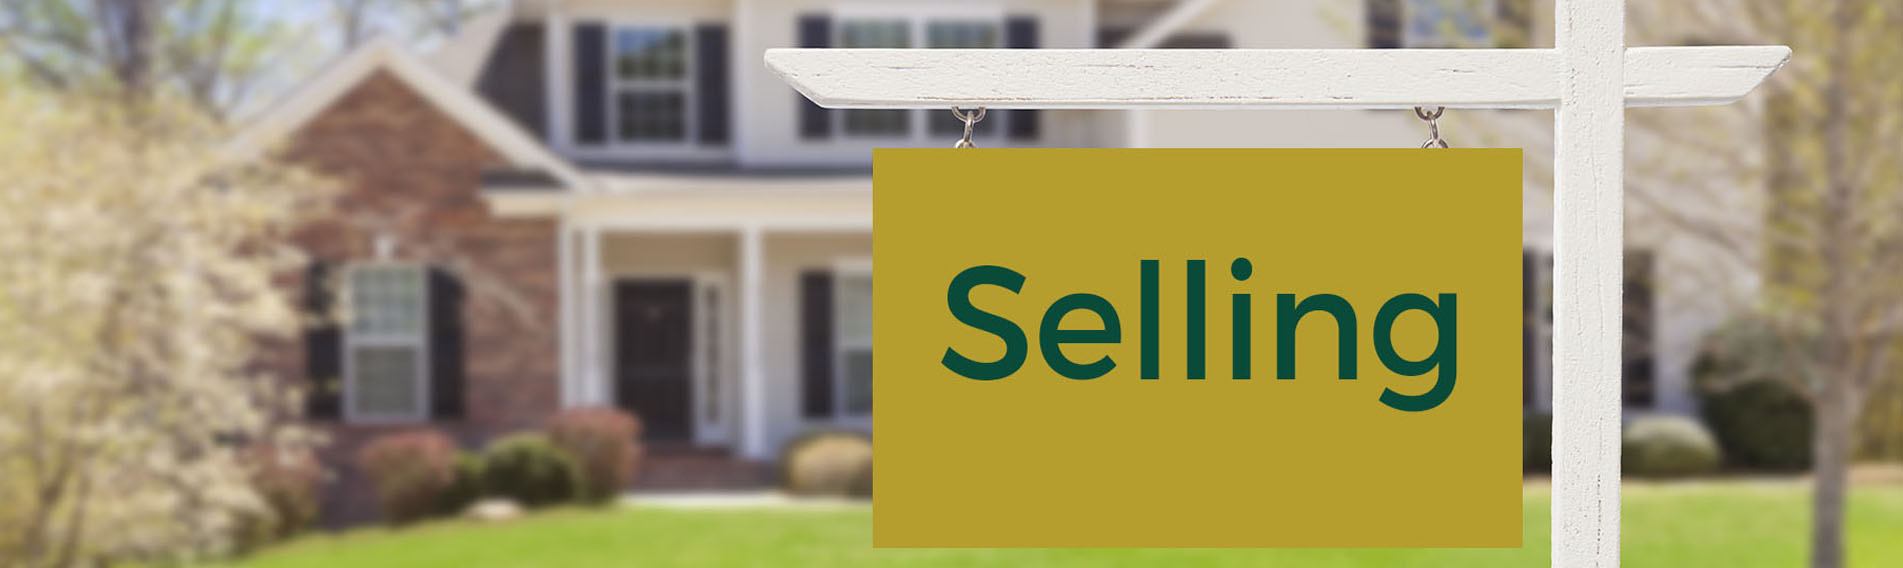 selling_resized